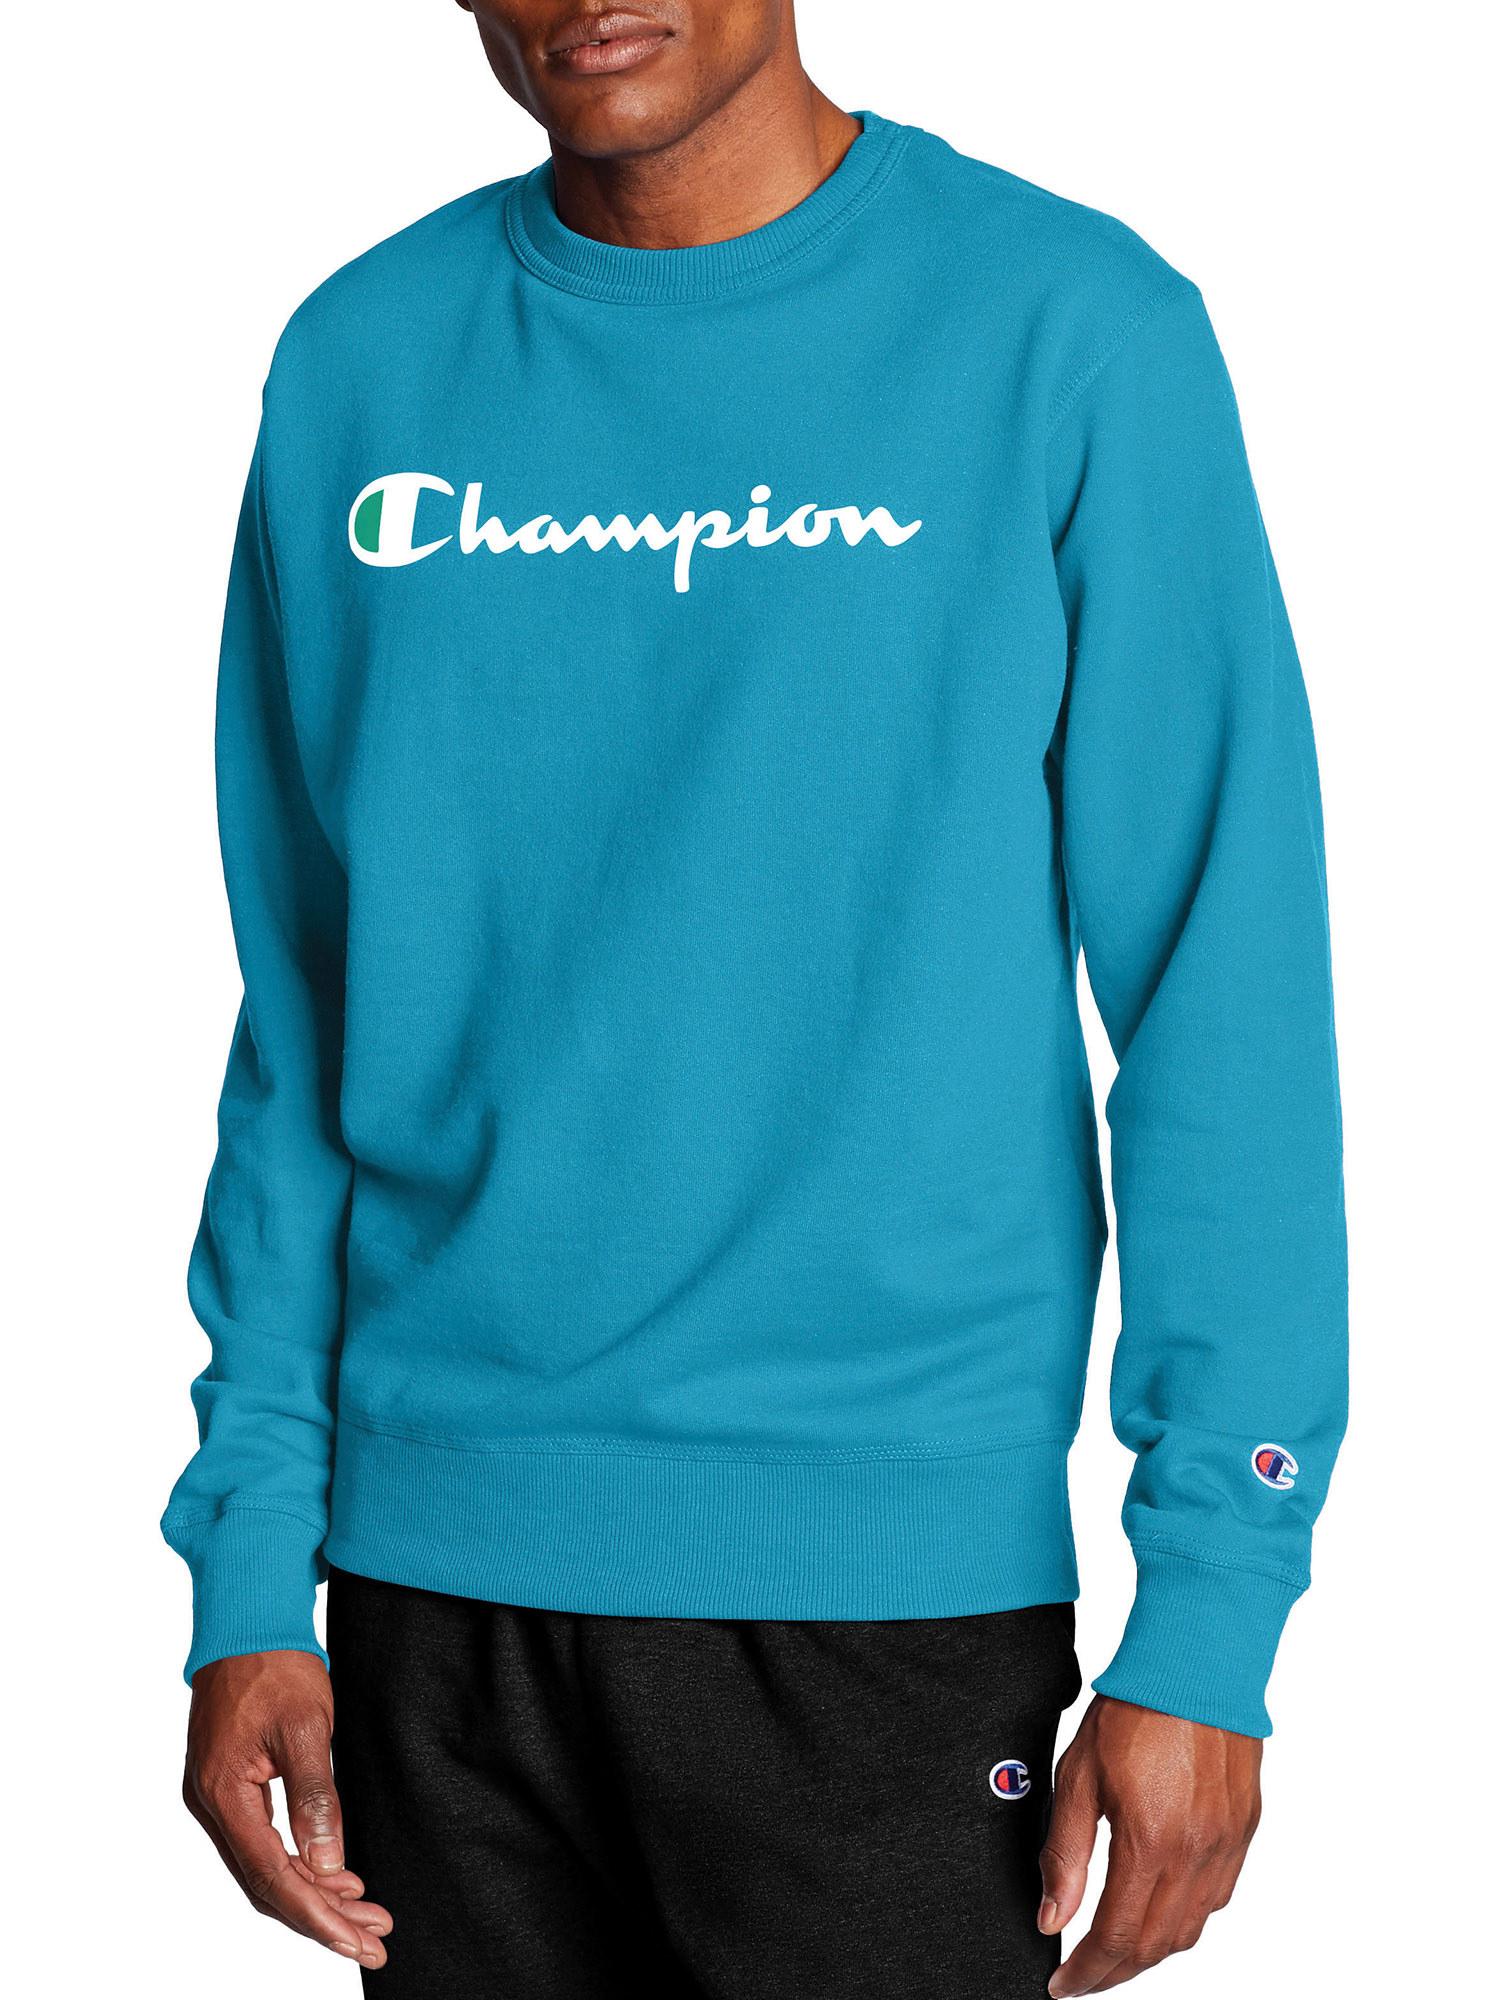 person wearing a blue champion crewneck sweatshirt